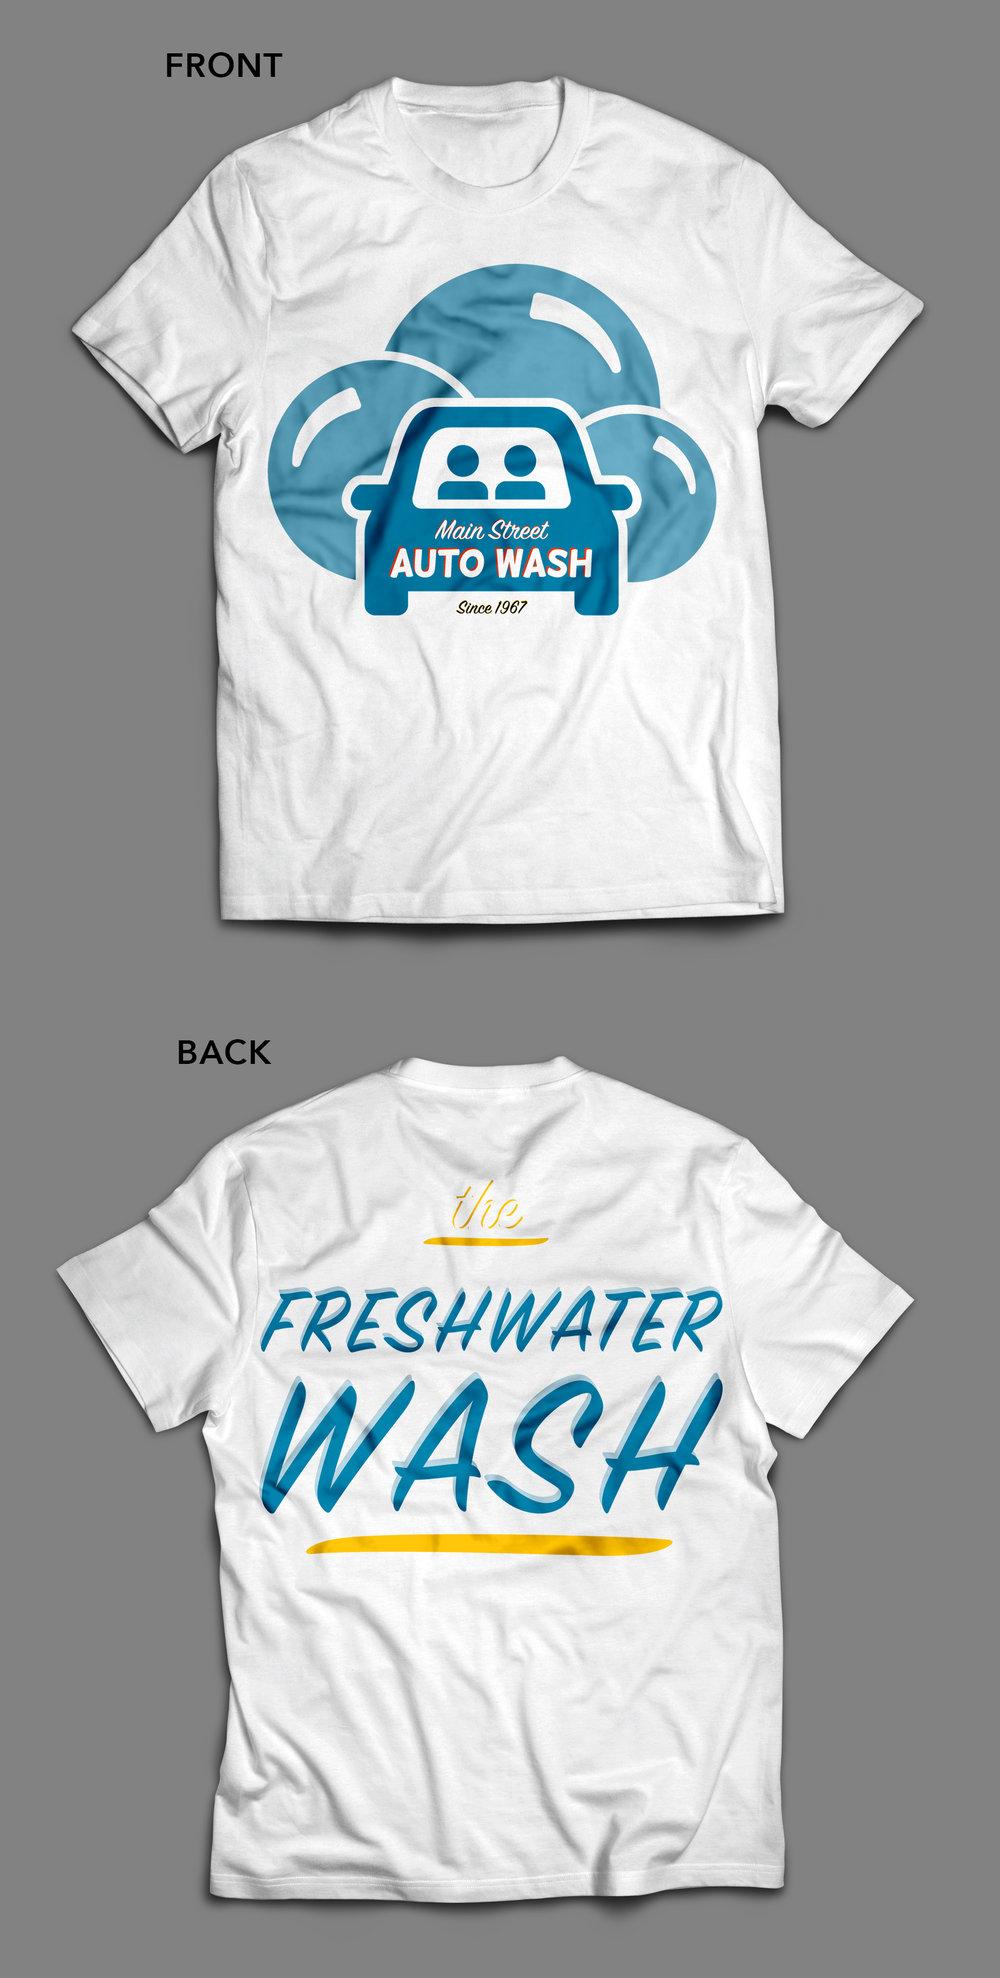 Main Street Auto Wash — Pretty Nifty Visuals